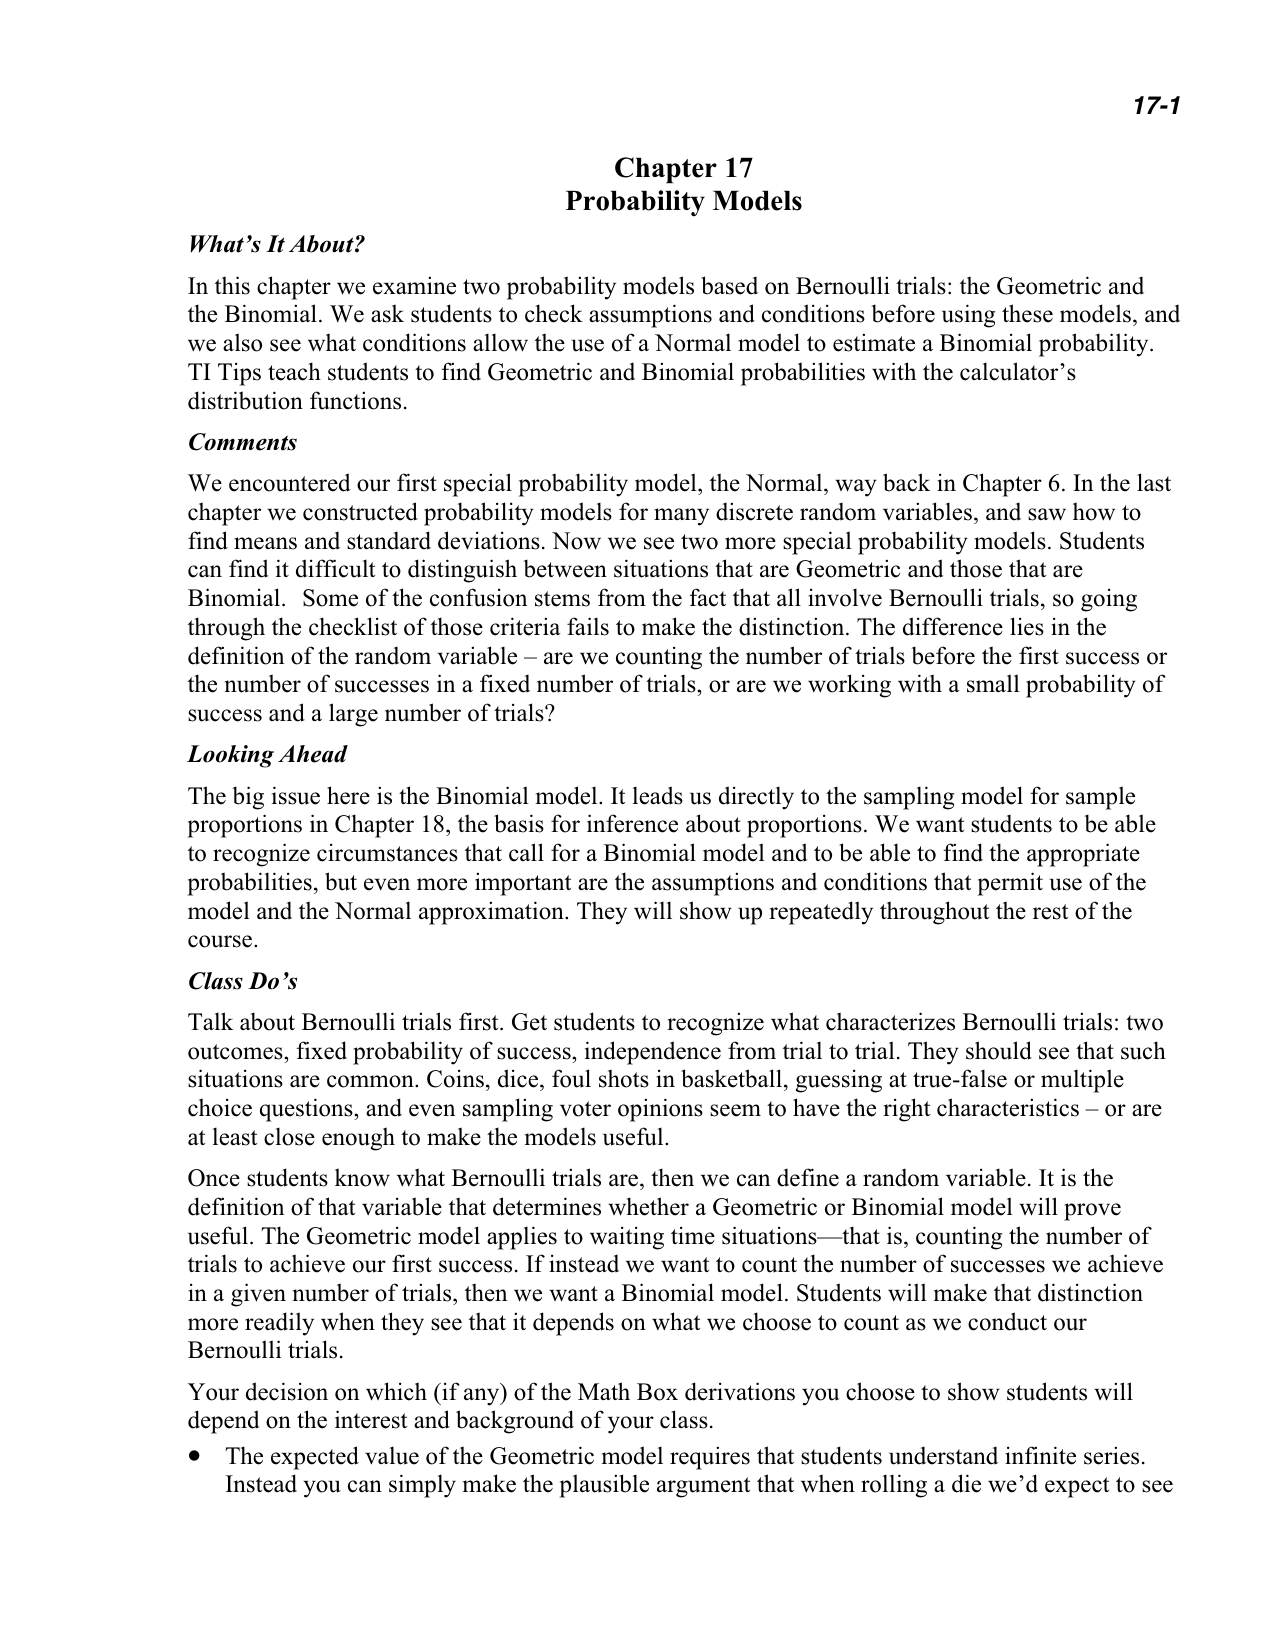 AP Statistics: PROBABILITY MODELS - YouTube